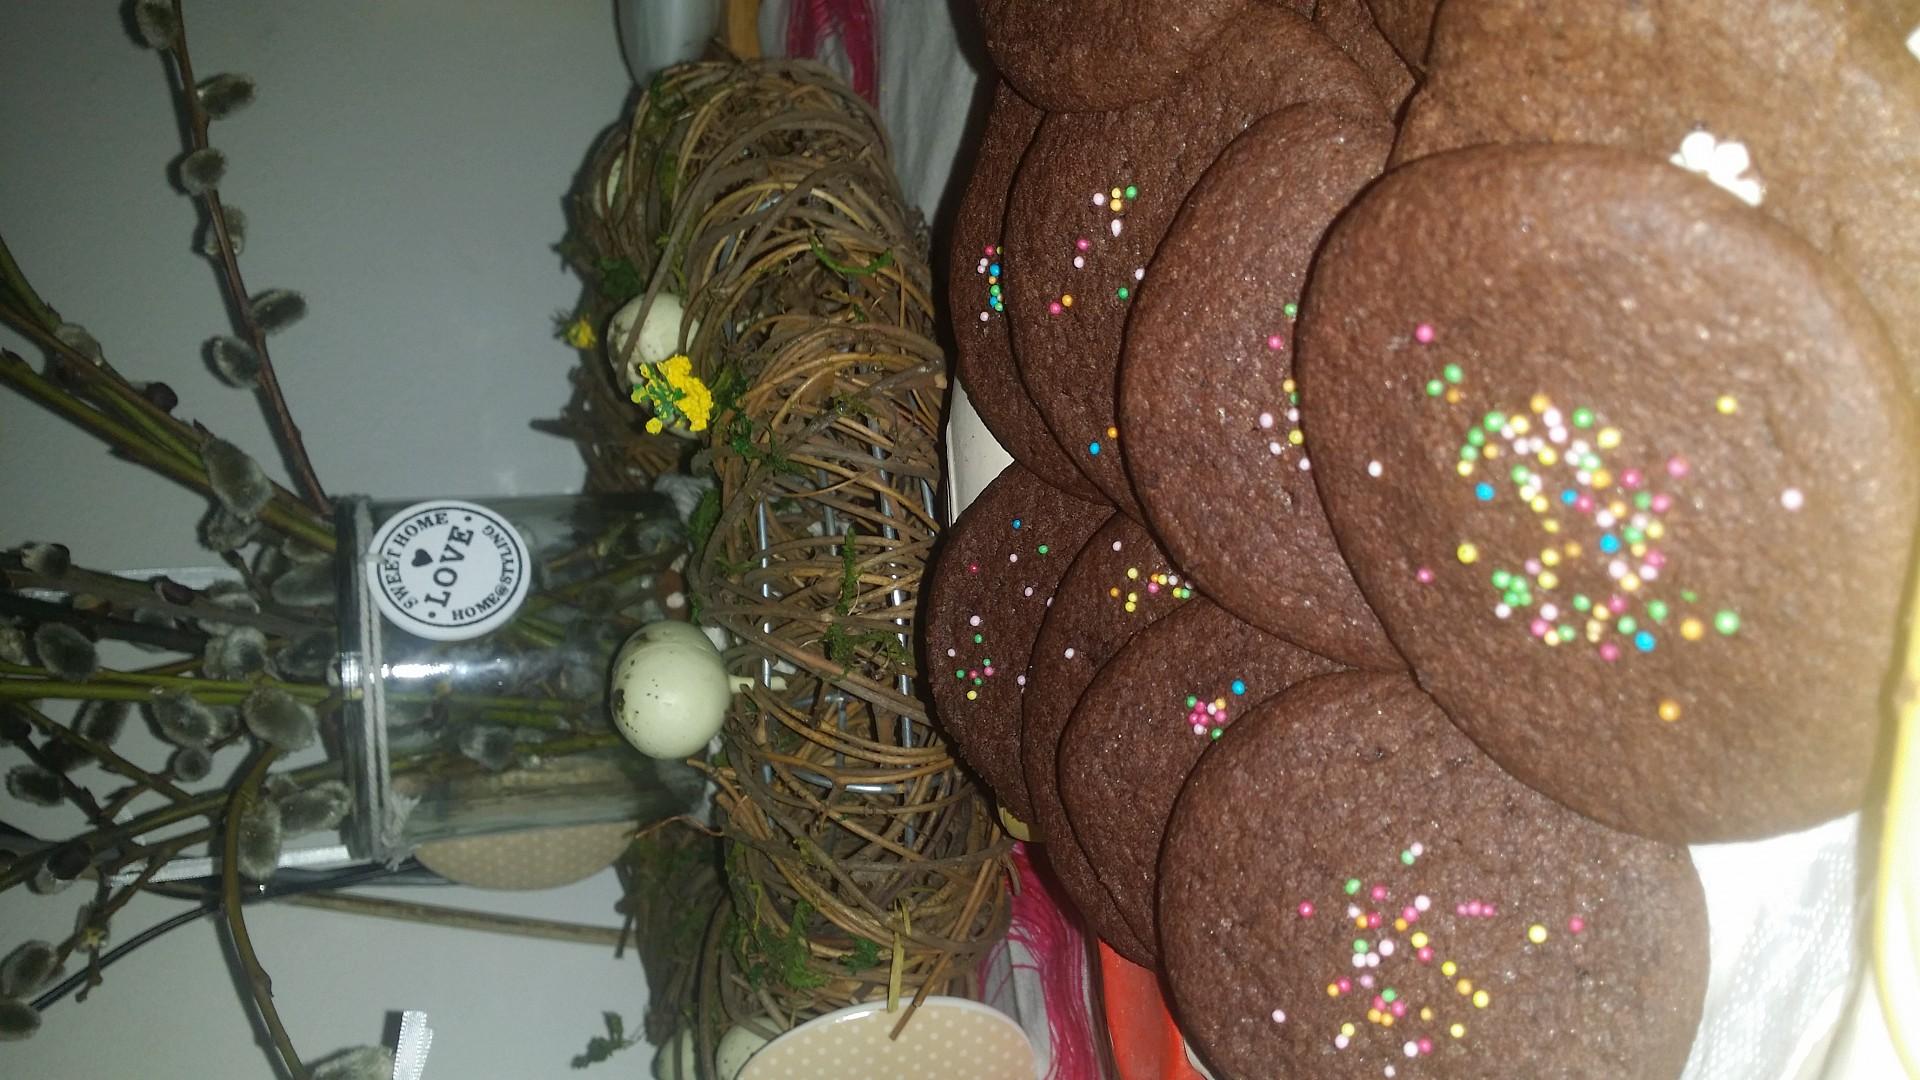 Čokocookies (vláčné a měkké)